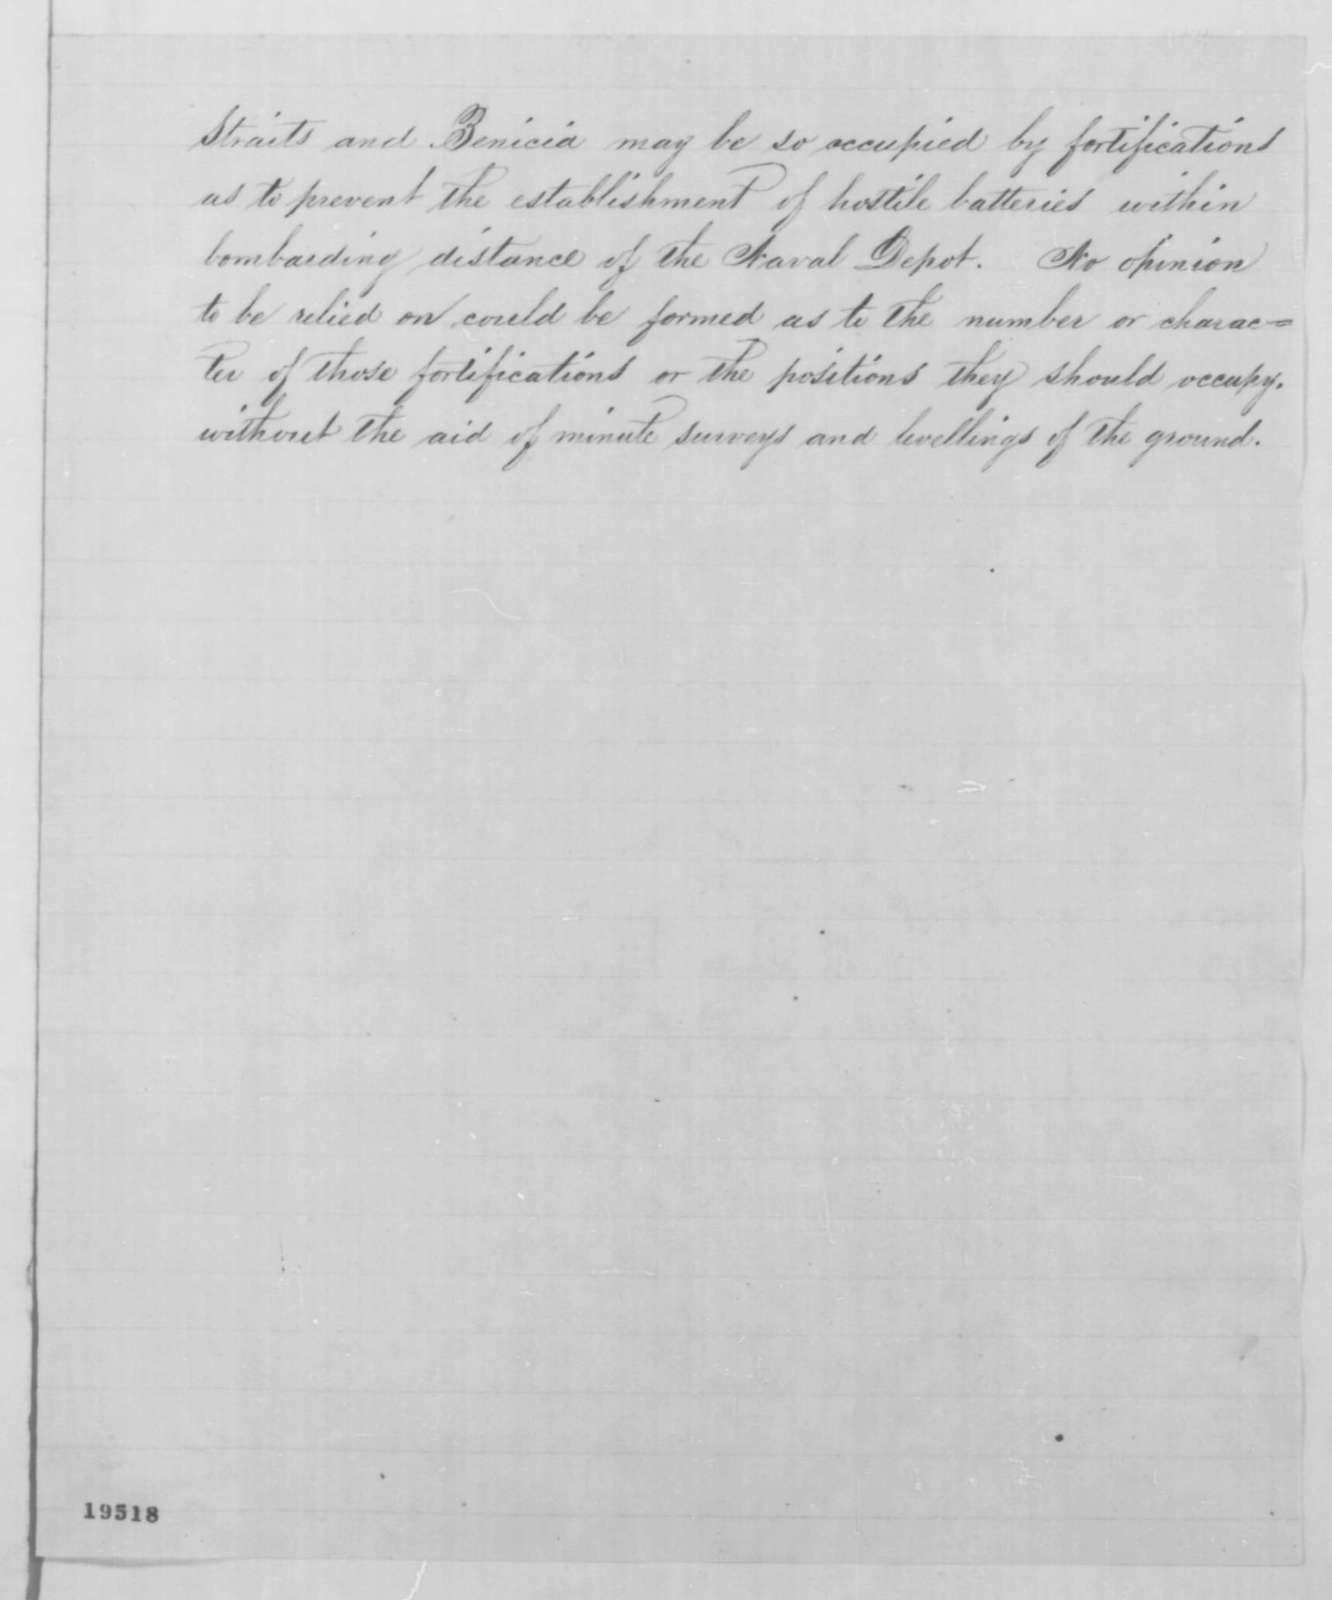 Joseph G. Totten to Edwin M. Stanton, Wednesday, November 12, 1862  (Defense of Pacific Coast)